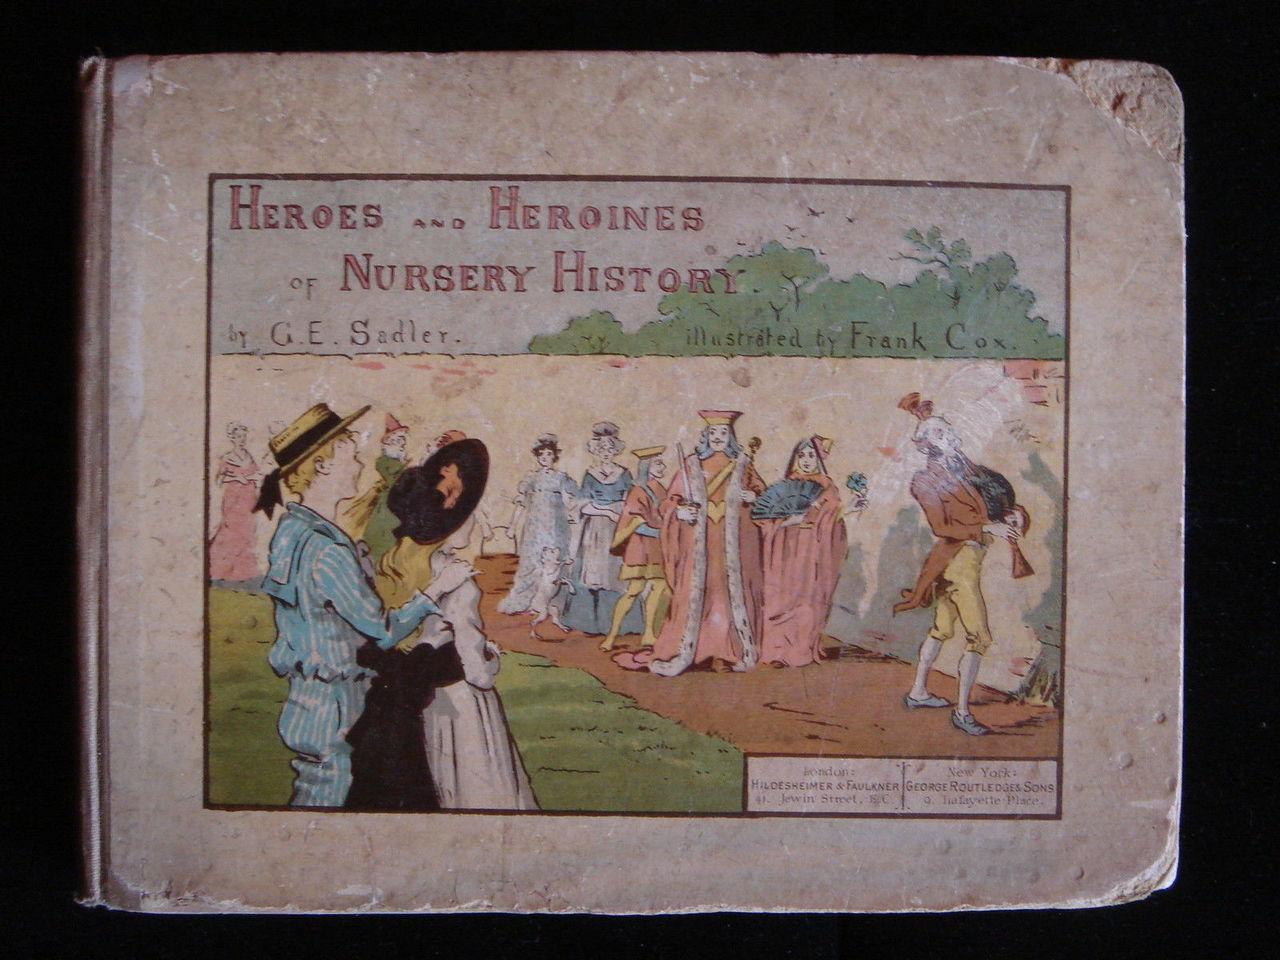 Heroes and Heroines of Nursery History G.E. Sadler Frank Cox 1884